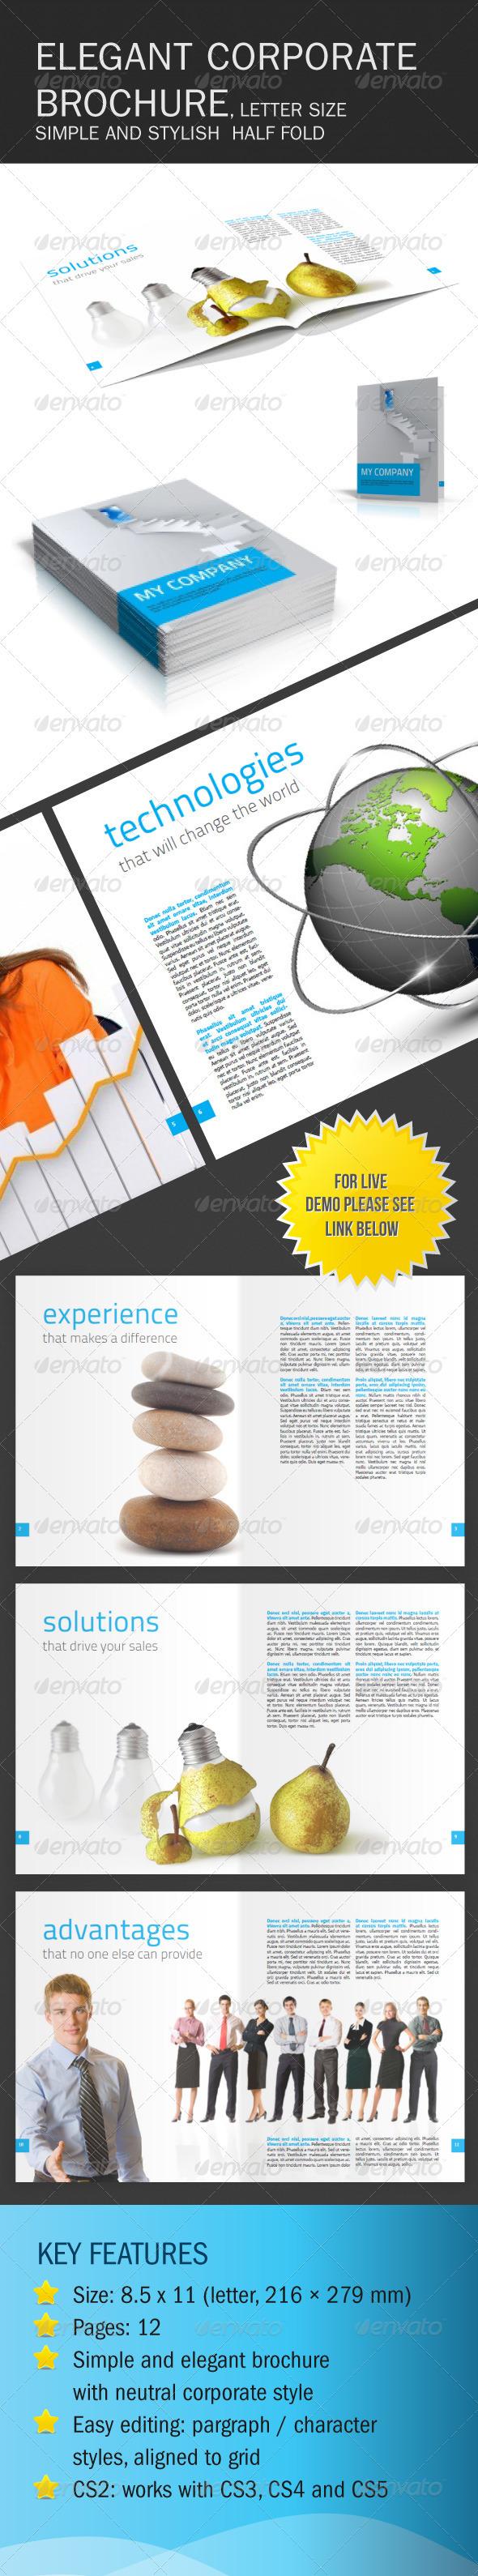 Clean and Elegant Corporate Brochure - Corporate Brochures